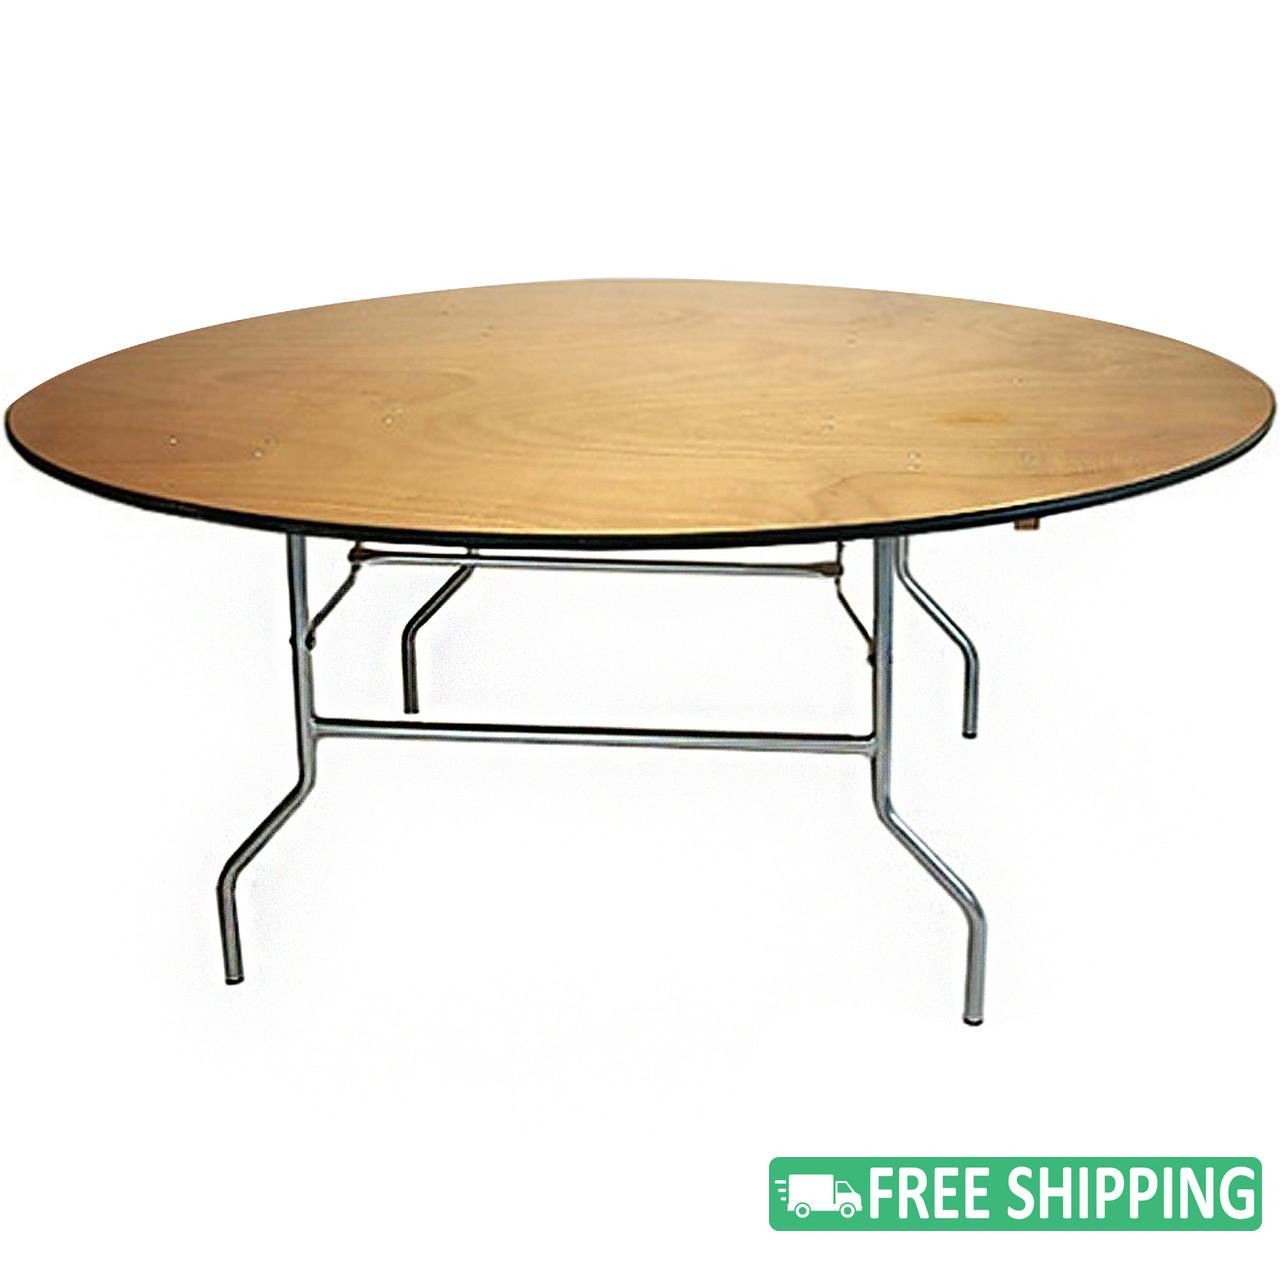 Bon 5 Pack: 6u0027 Round Wood Folding Banquet Tables [FTPW72R 05] | Round Wooden Banquet  Tables